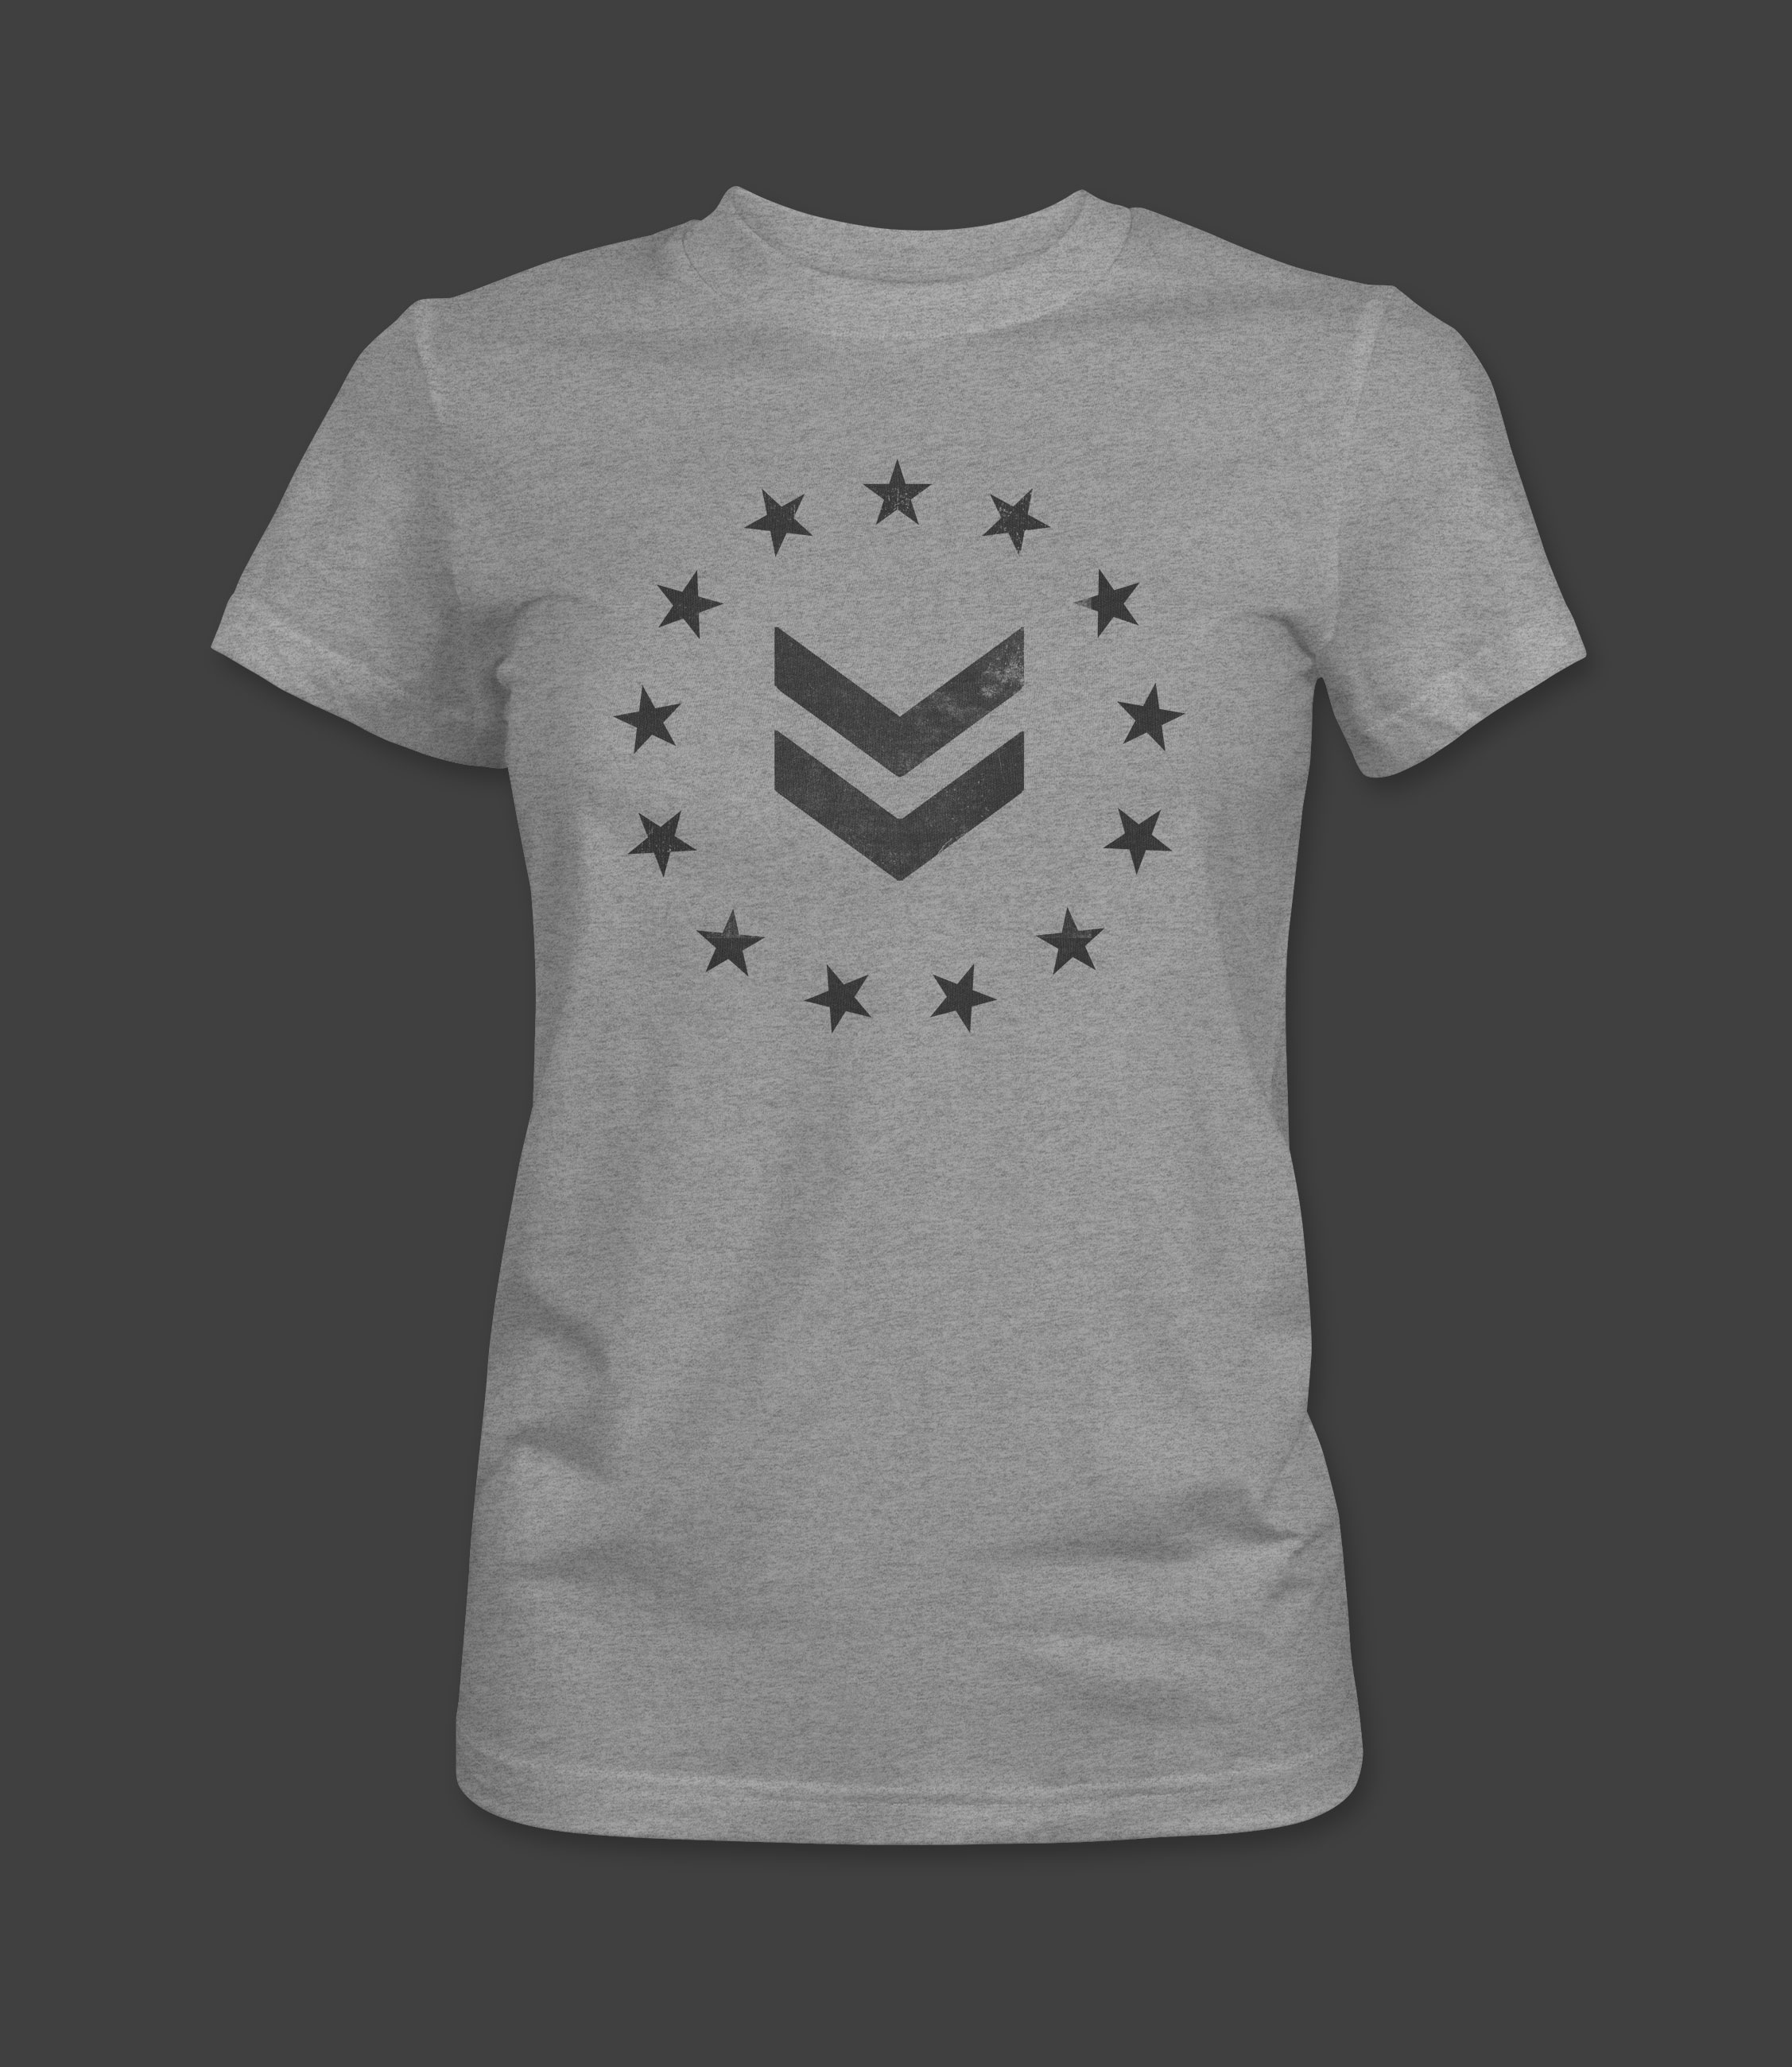 Strategic Athlete Women's Shirt